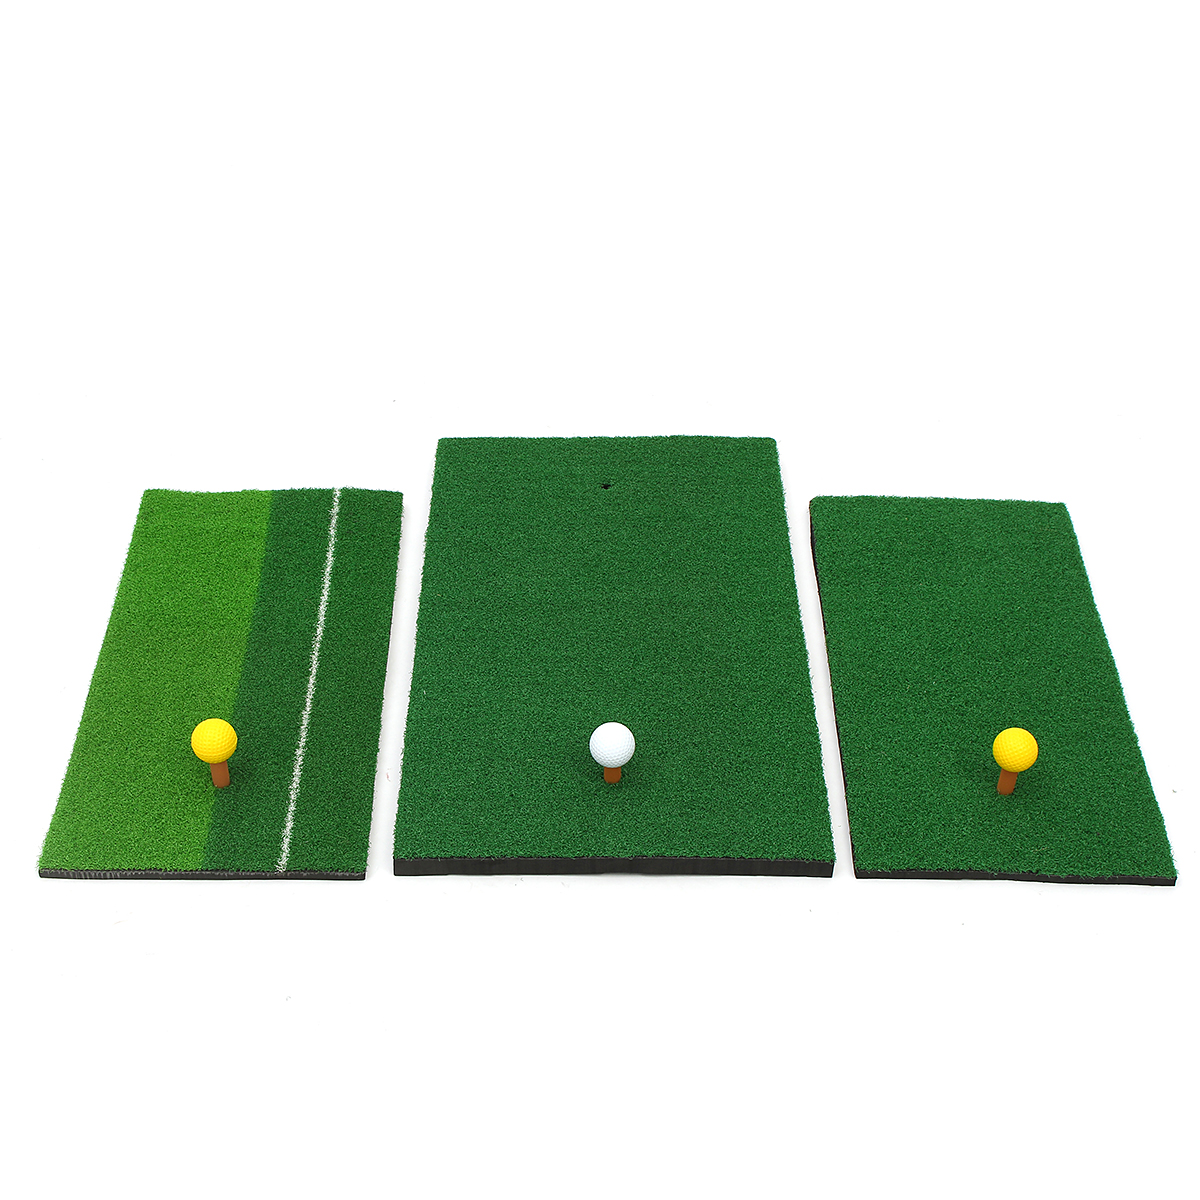 Golf Putting Training Mats Nylon Turf Chipping Driving Range Practice Mat Indoor Alexnld Com